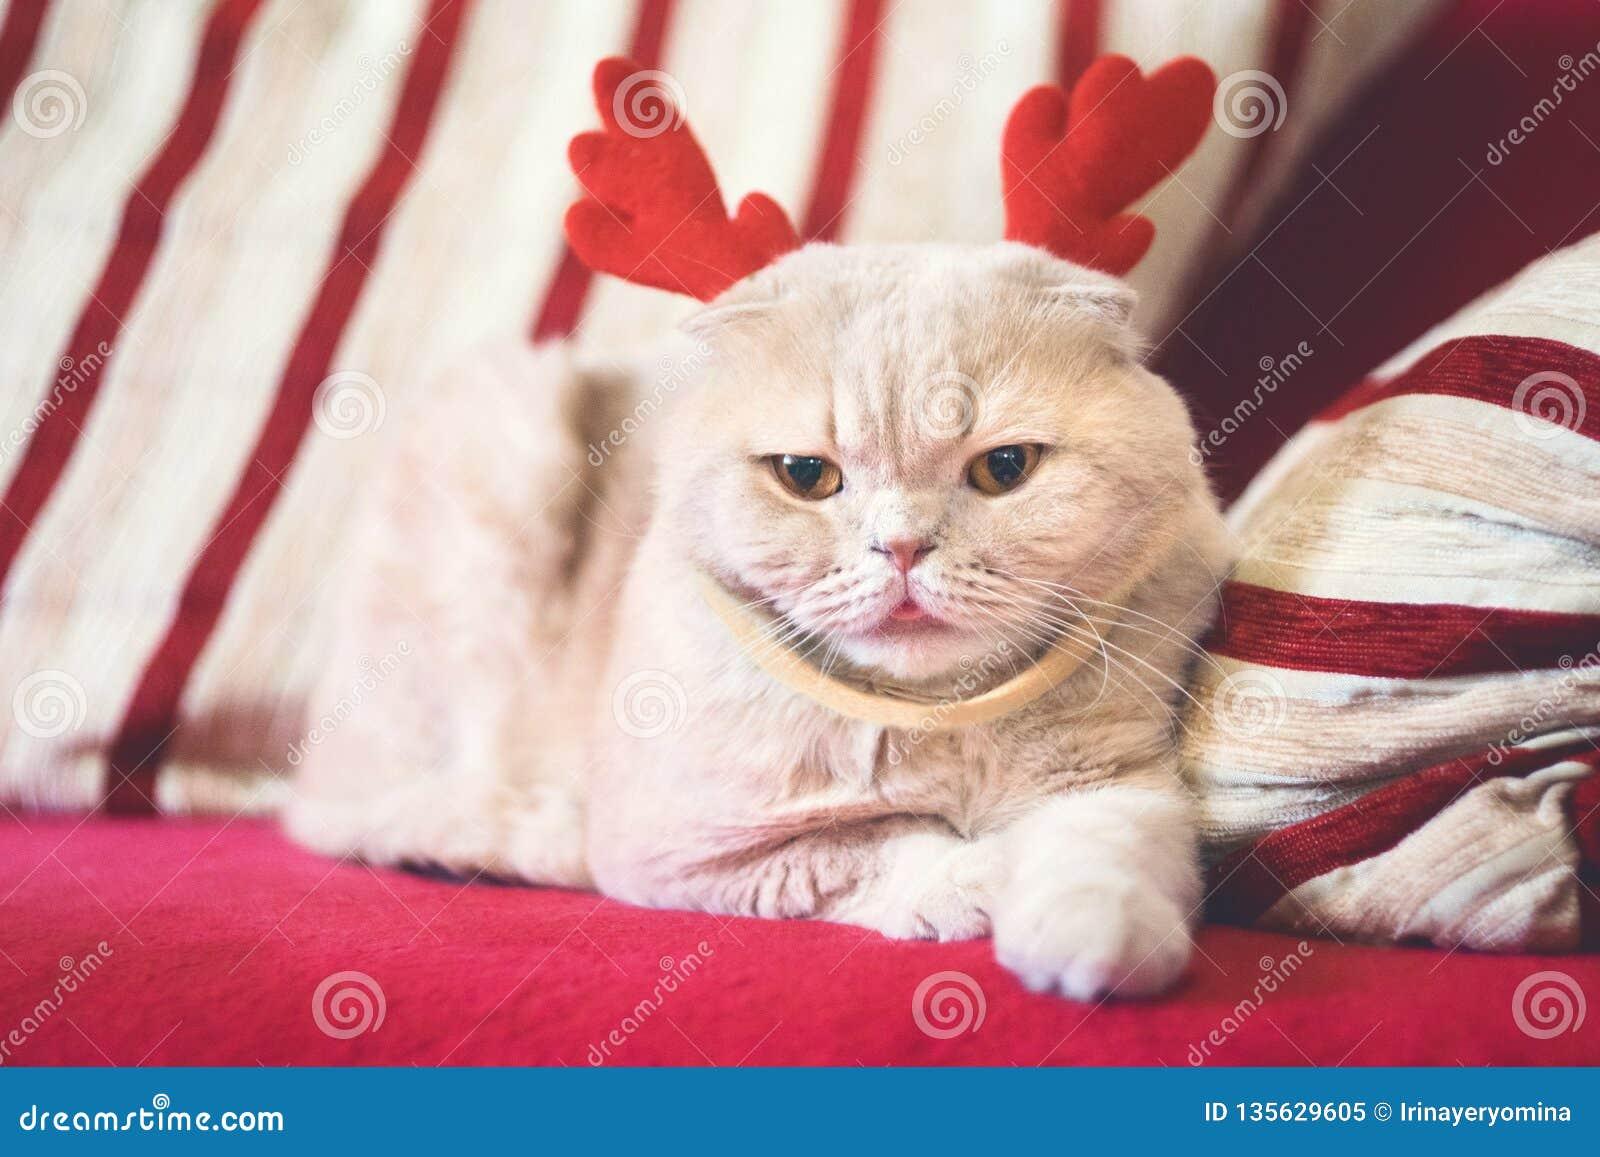 Cute Scottish Fold cat with reindeer Christmas horns. Cream cat dressed as reindeer Rudolph. Christmas animals